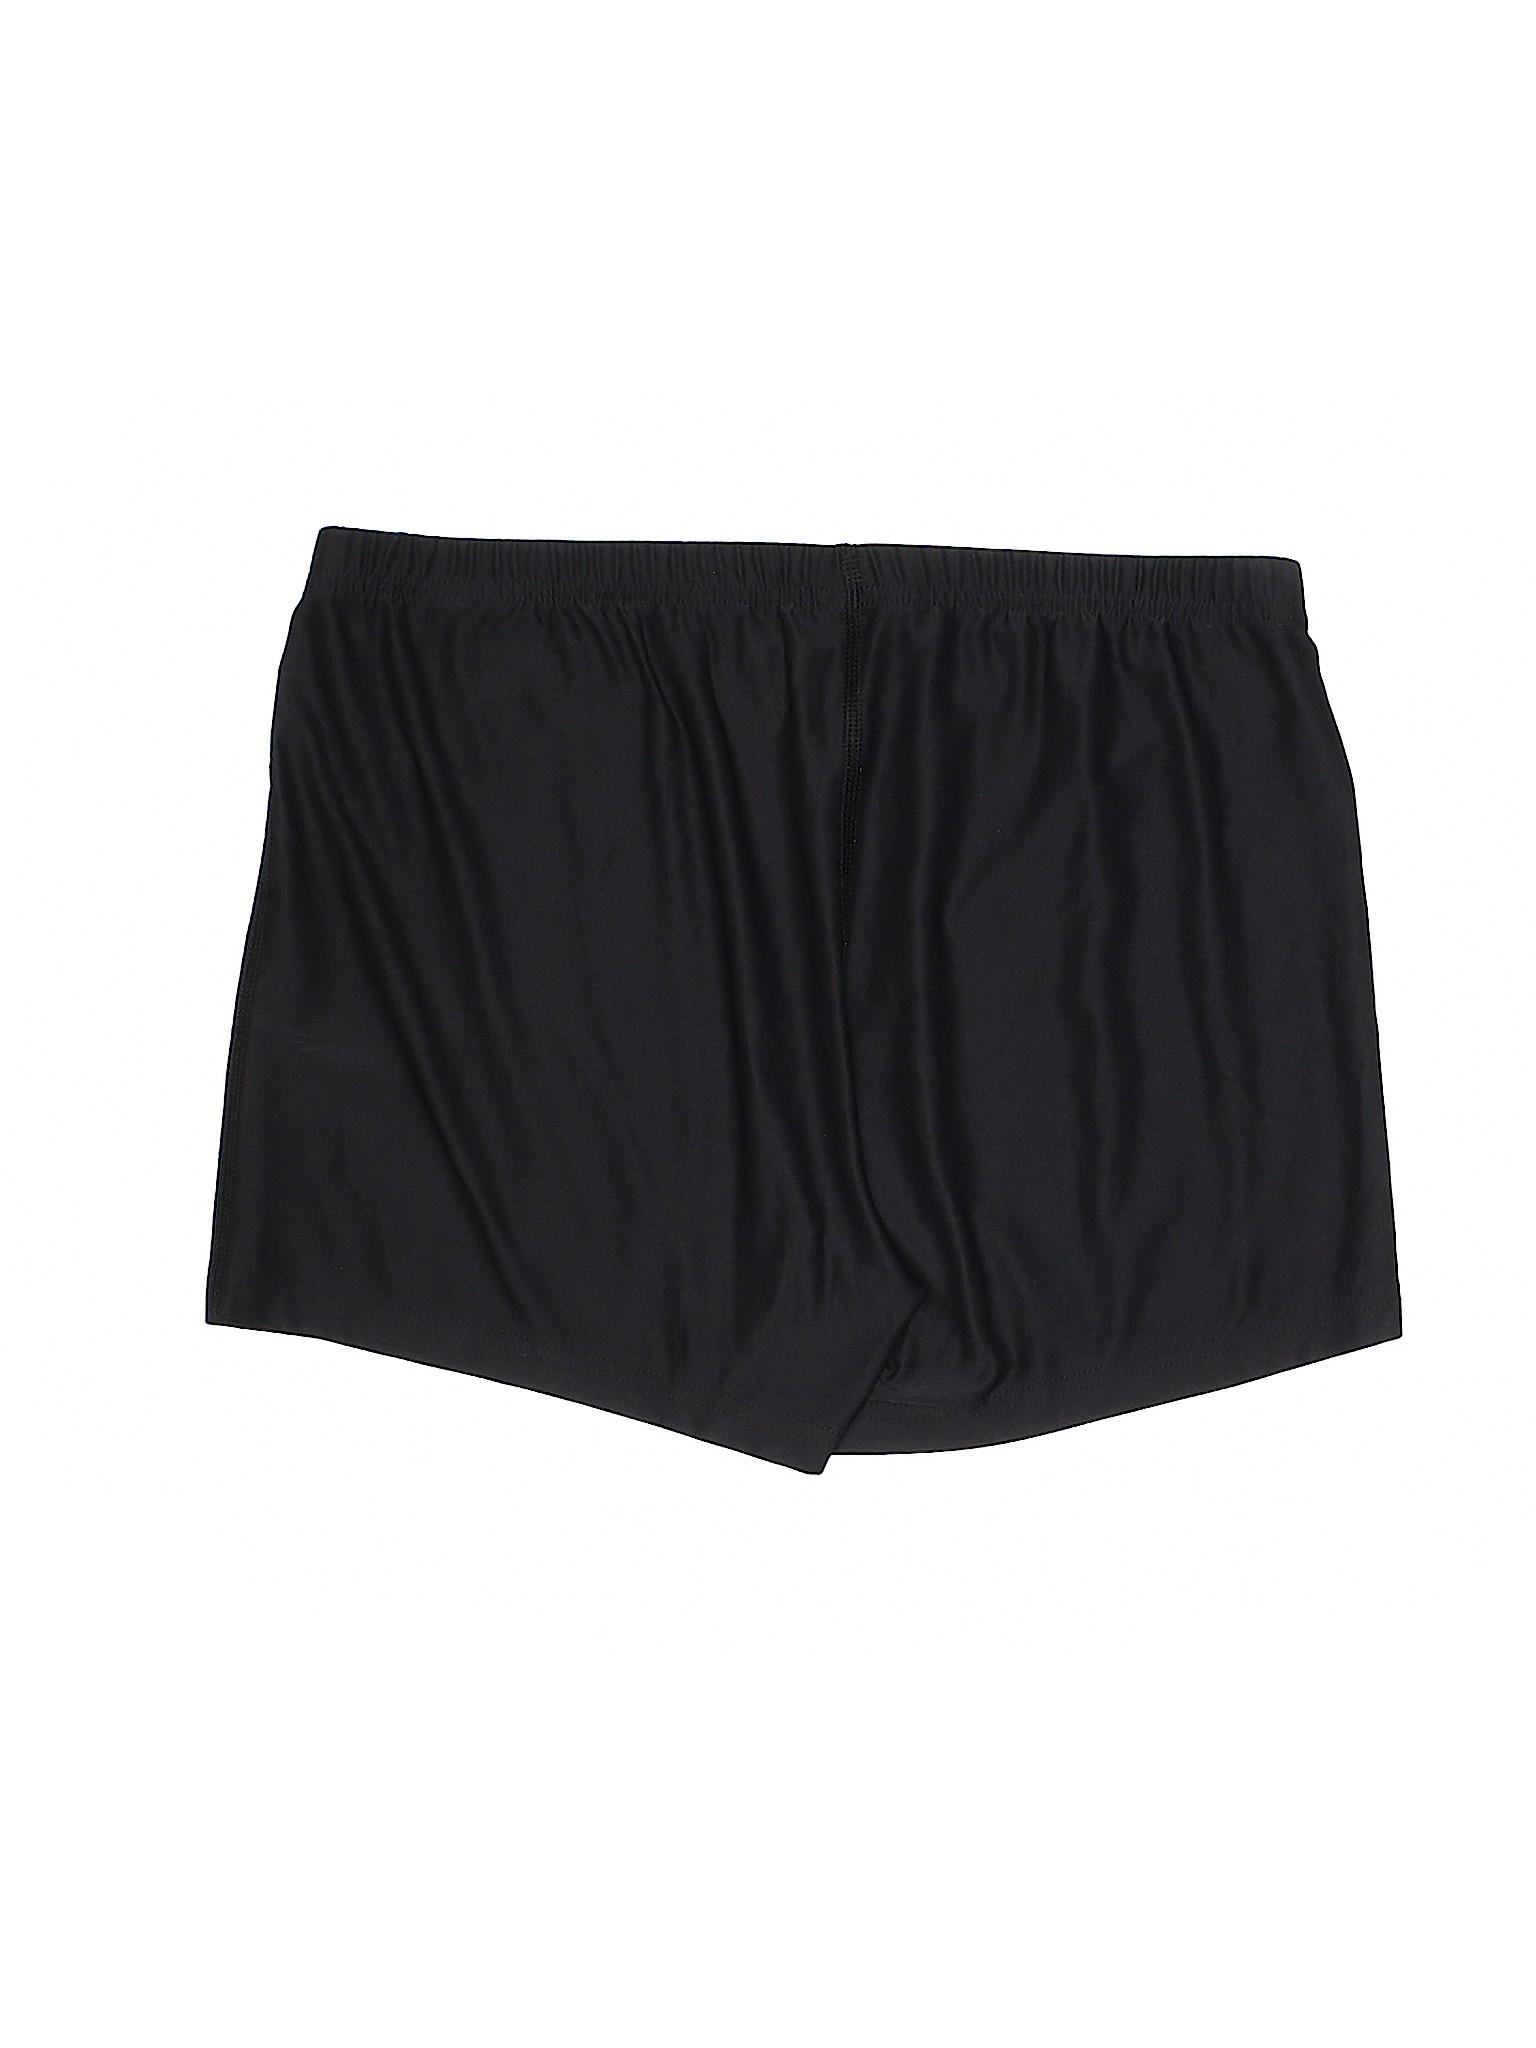 Athletic Shorts Boutique Boutique Reebok Reebok wtWxPC0wFq